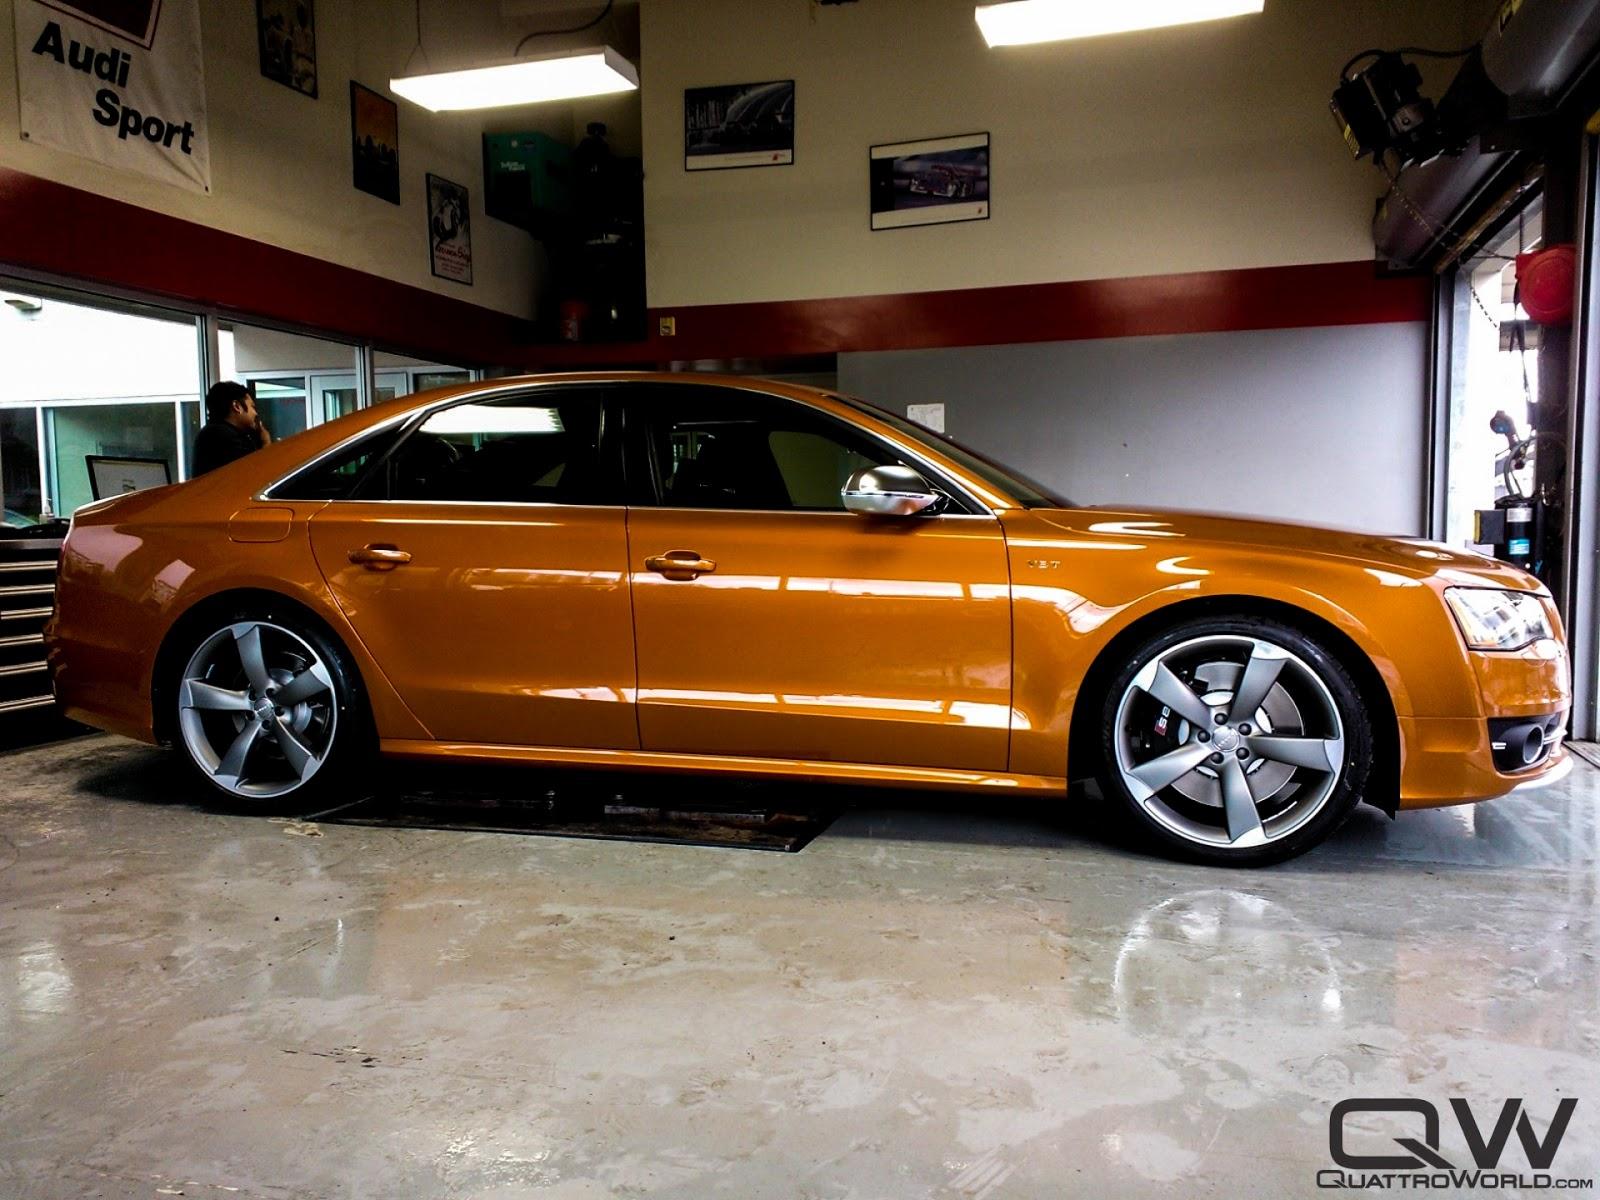 Audi+S8+Samoa+Orange+2.jpg